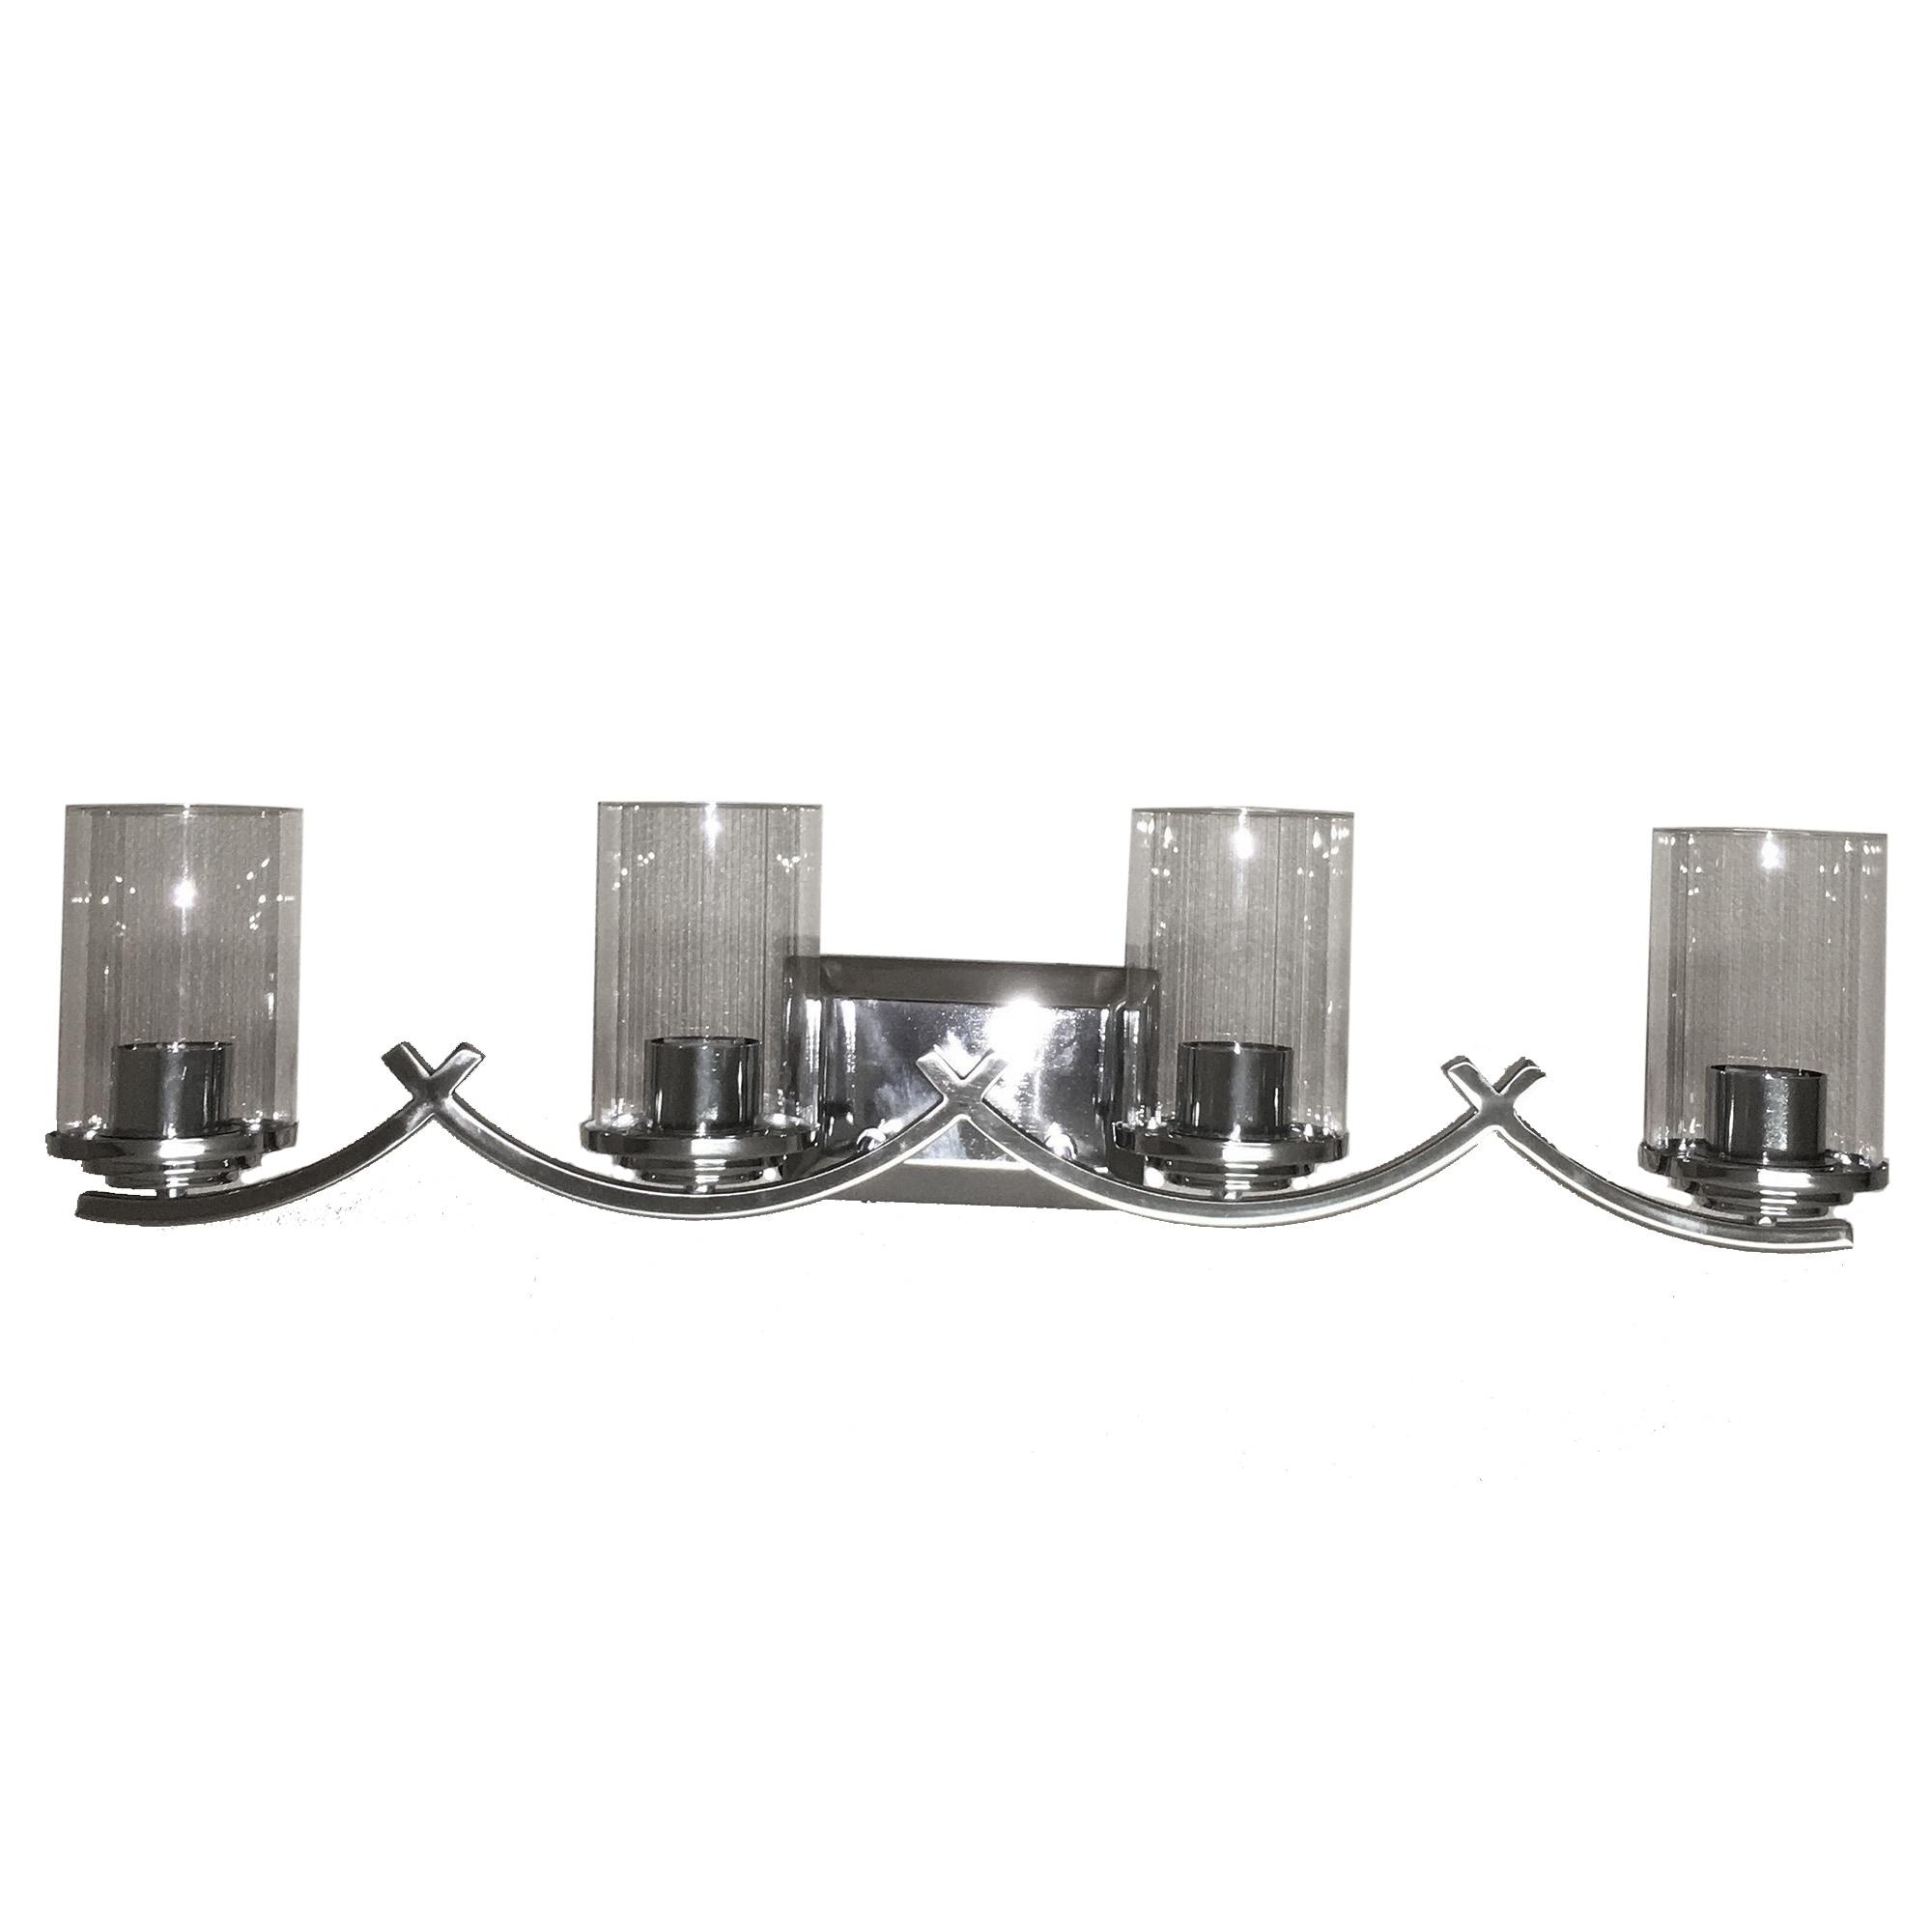 Brina 4 light vanity lighting in chrome